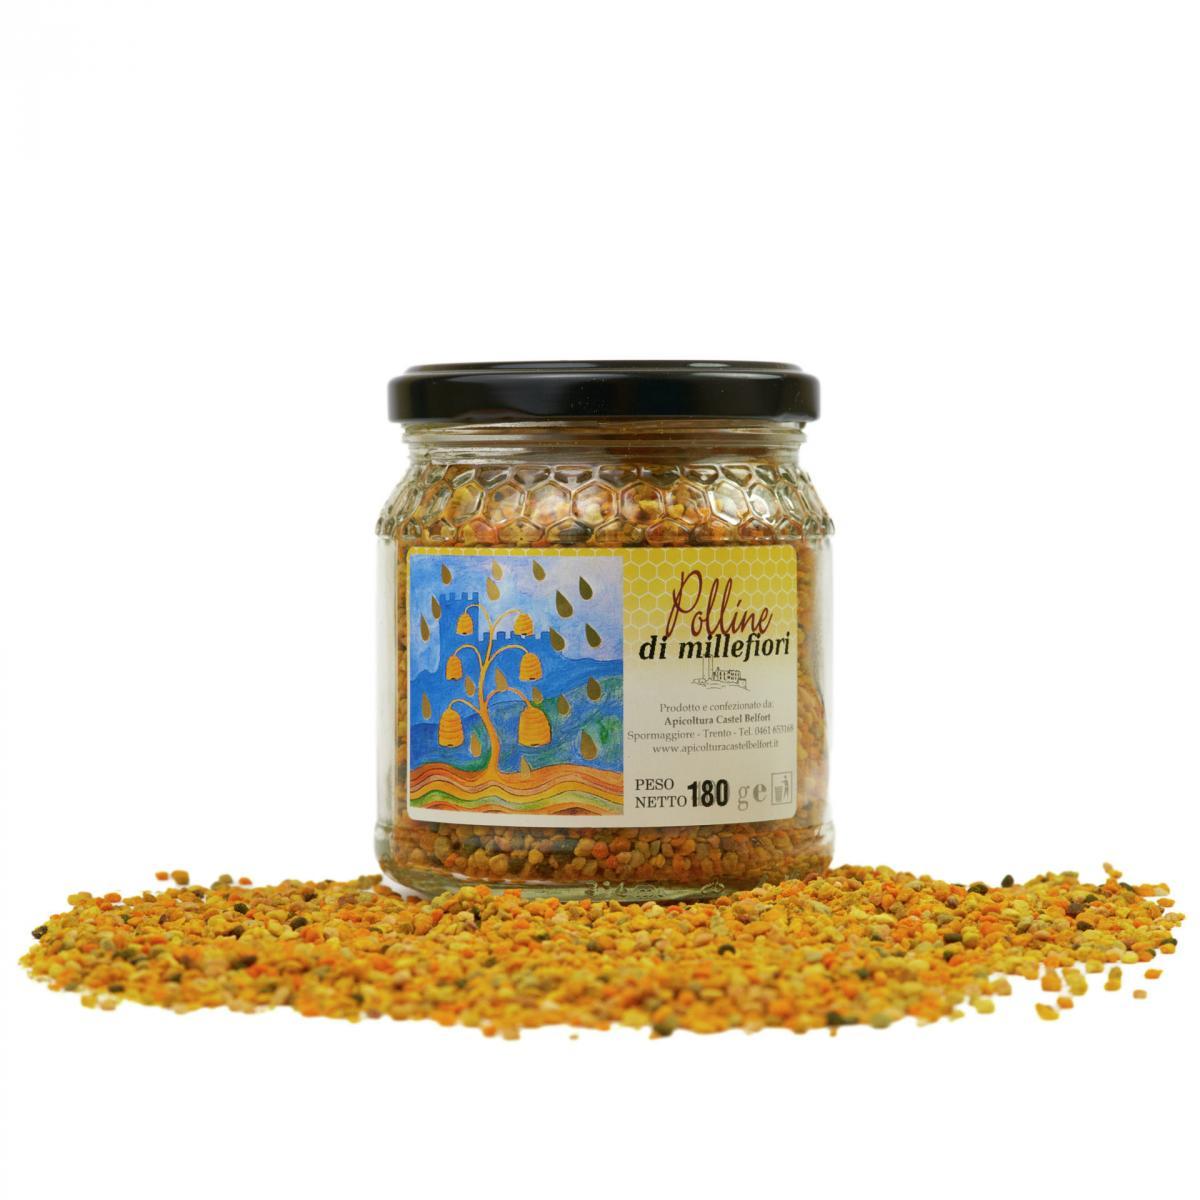 Polline di millefiori